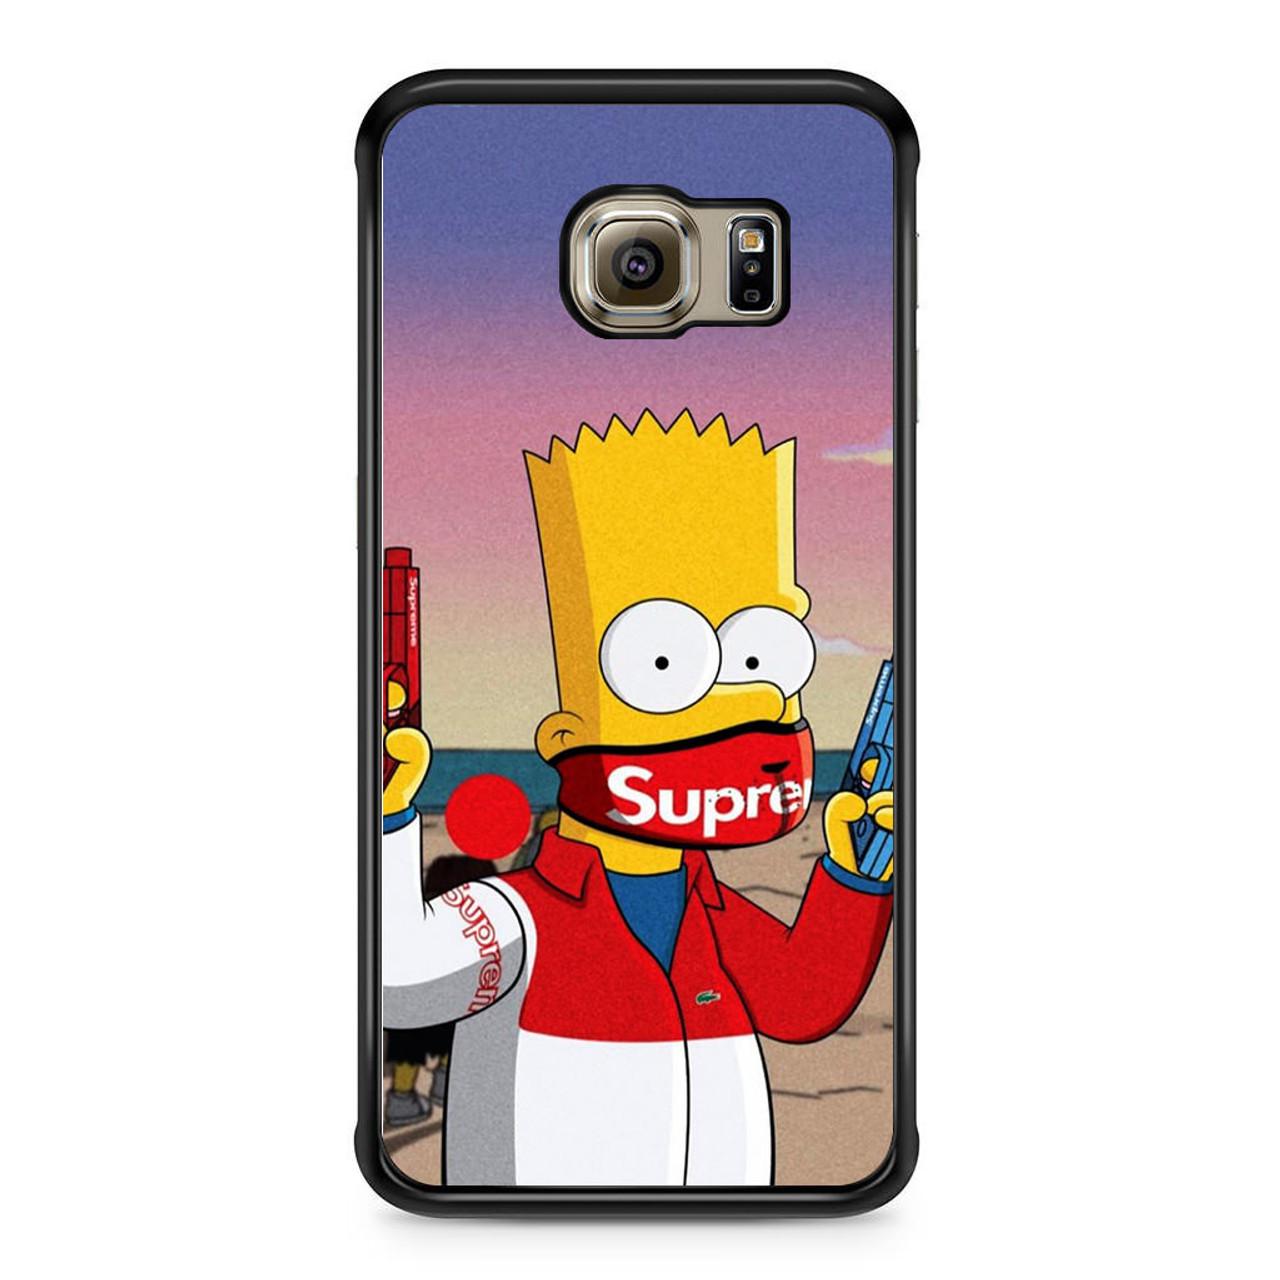 new styles 812c4 36eab Bart Supreme Samsung Galaxy S6 Edge Case